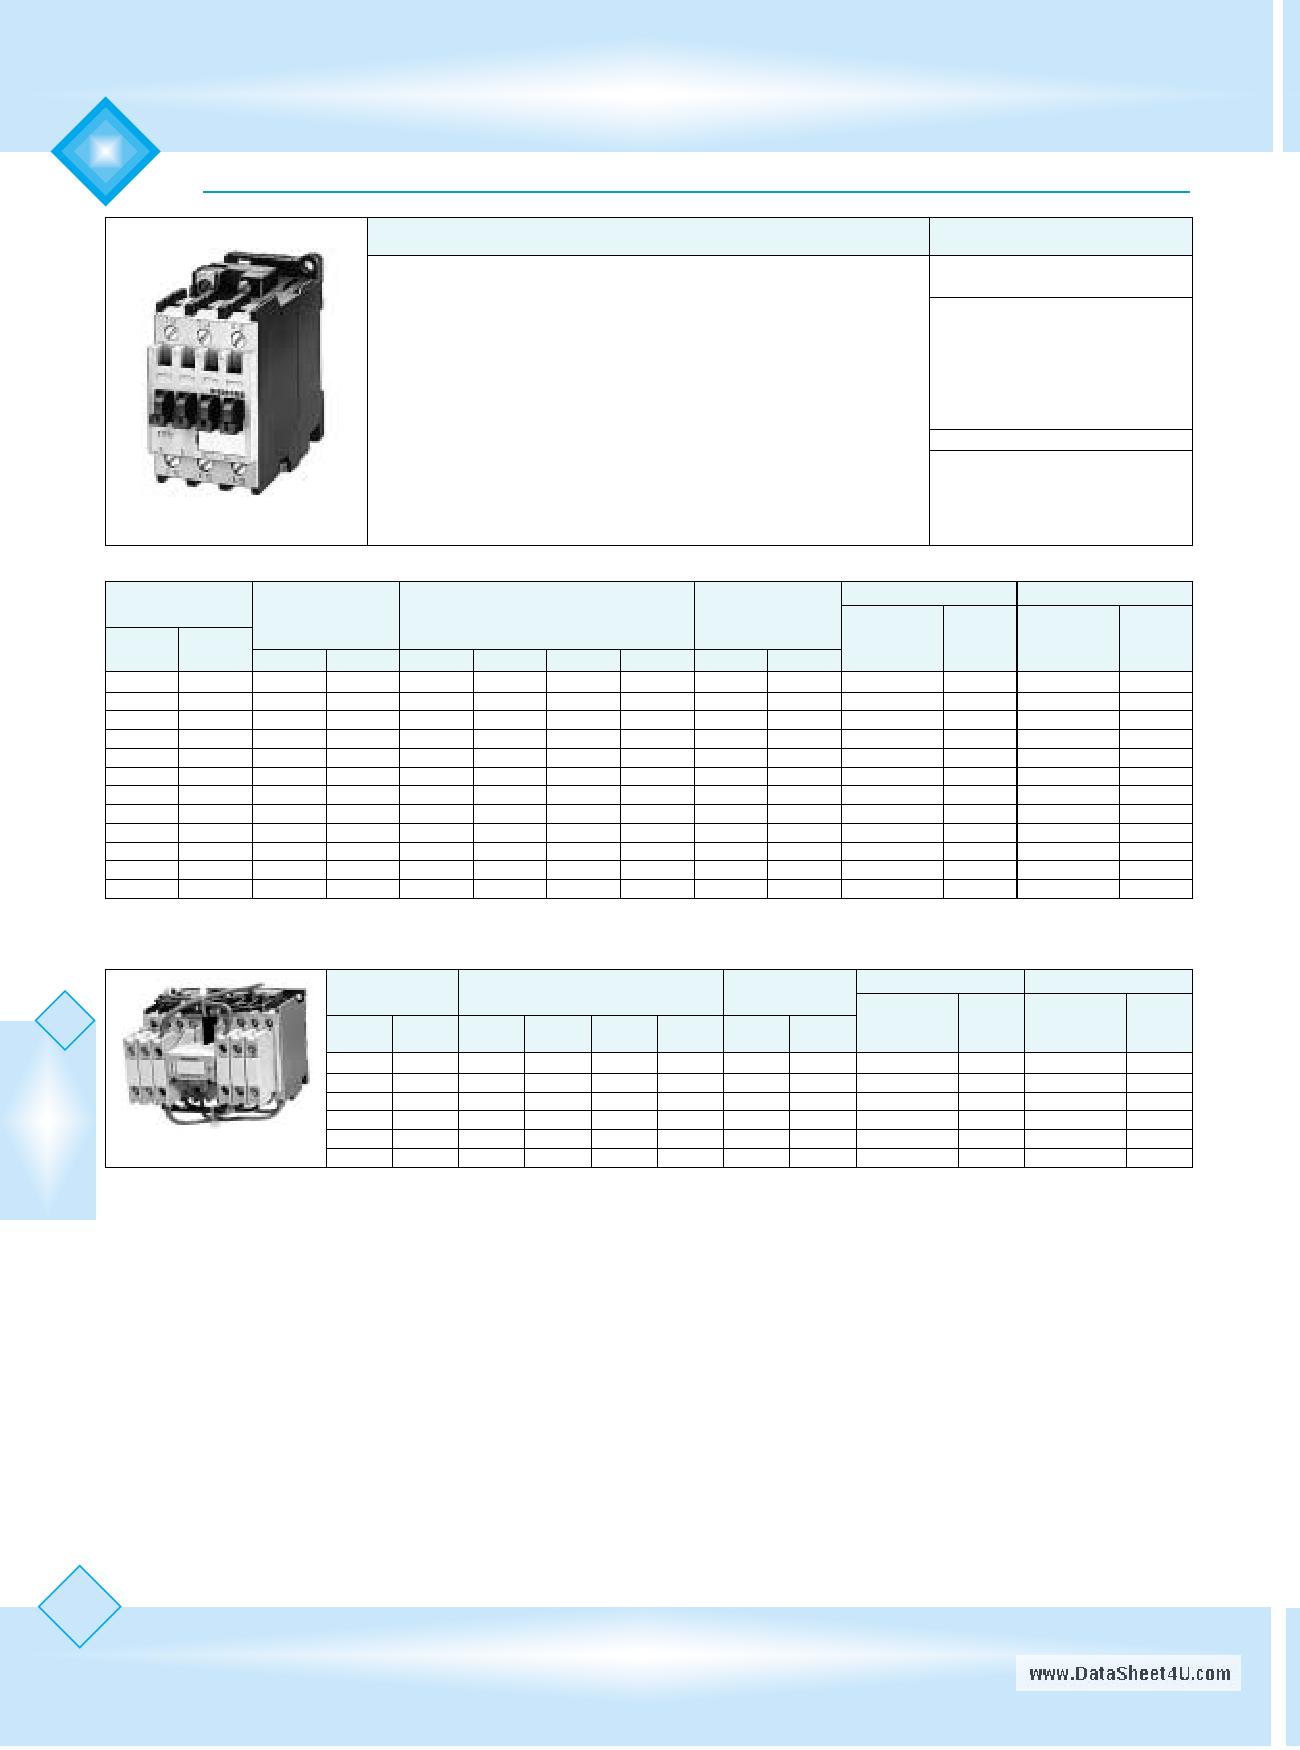 3TF3500-0A Datasheet, 3TF3500-0A PDF,ピン配置, 機能